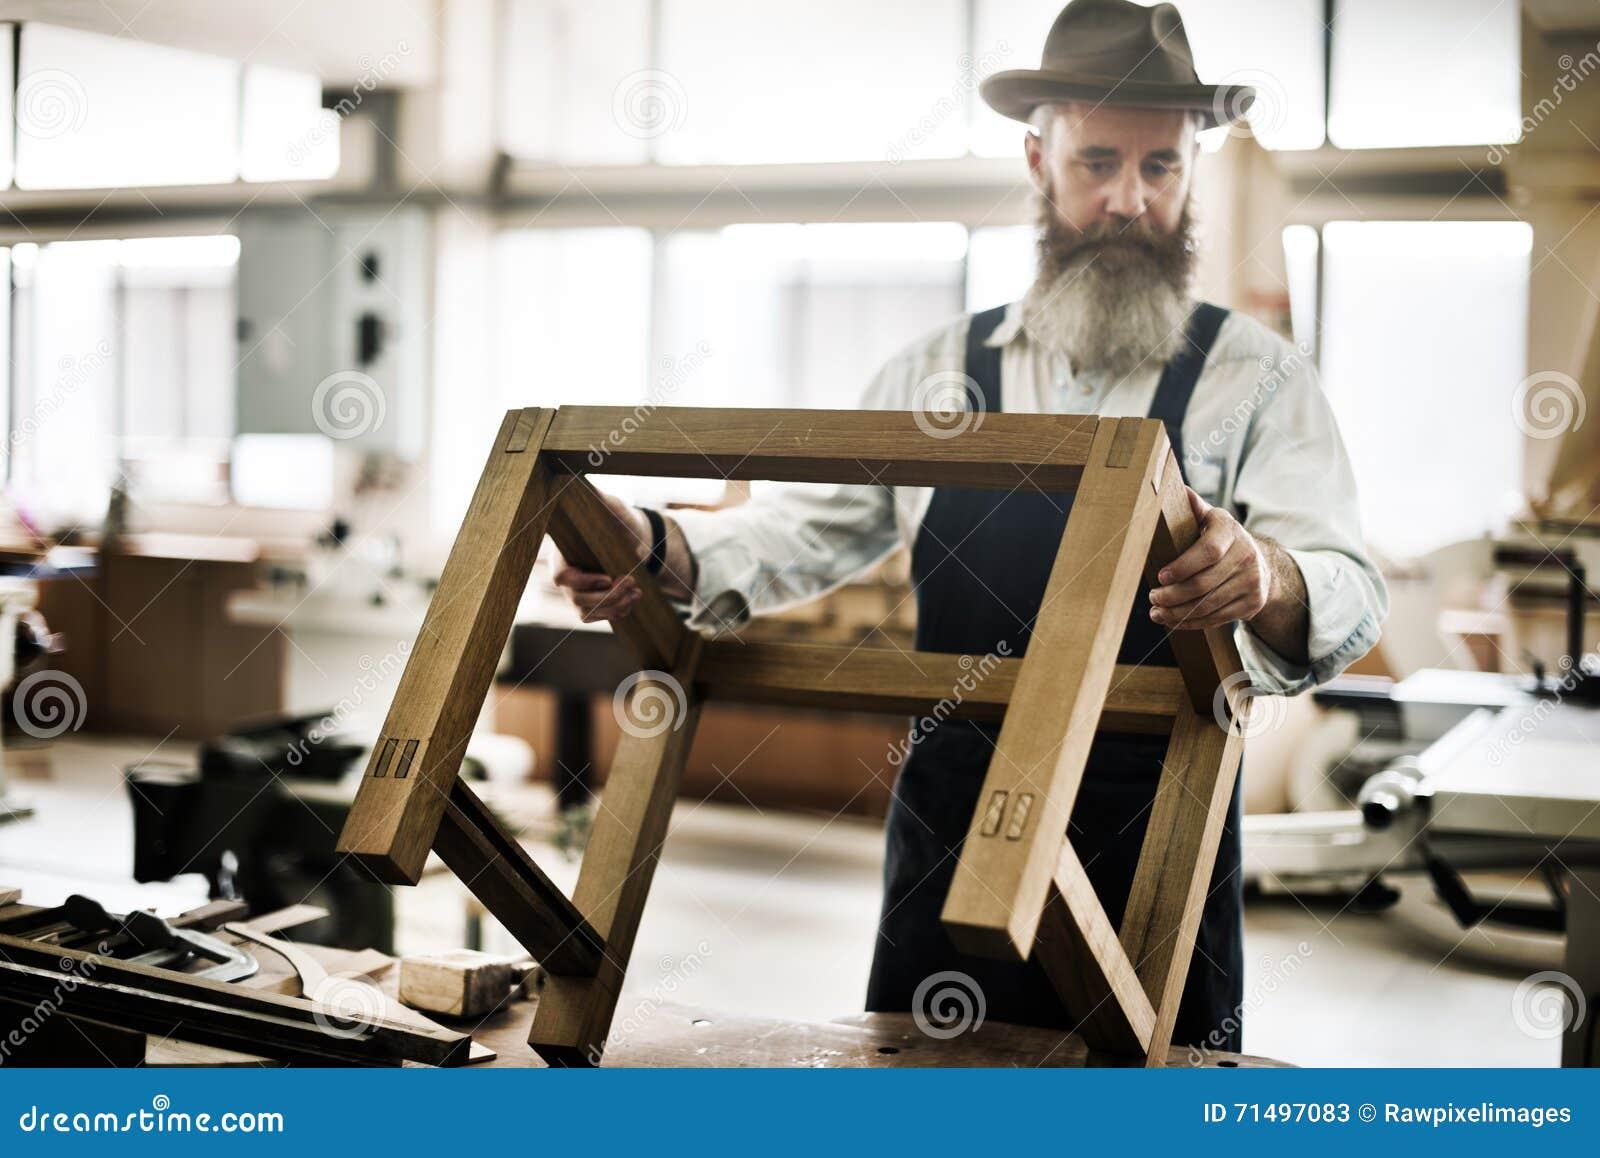 De Houten Conc Workshop van timmermanscraftmanship carpentry handicraft